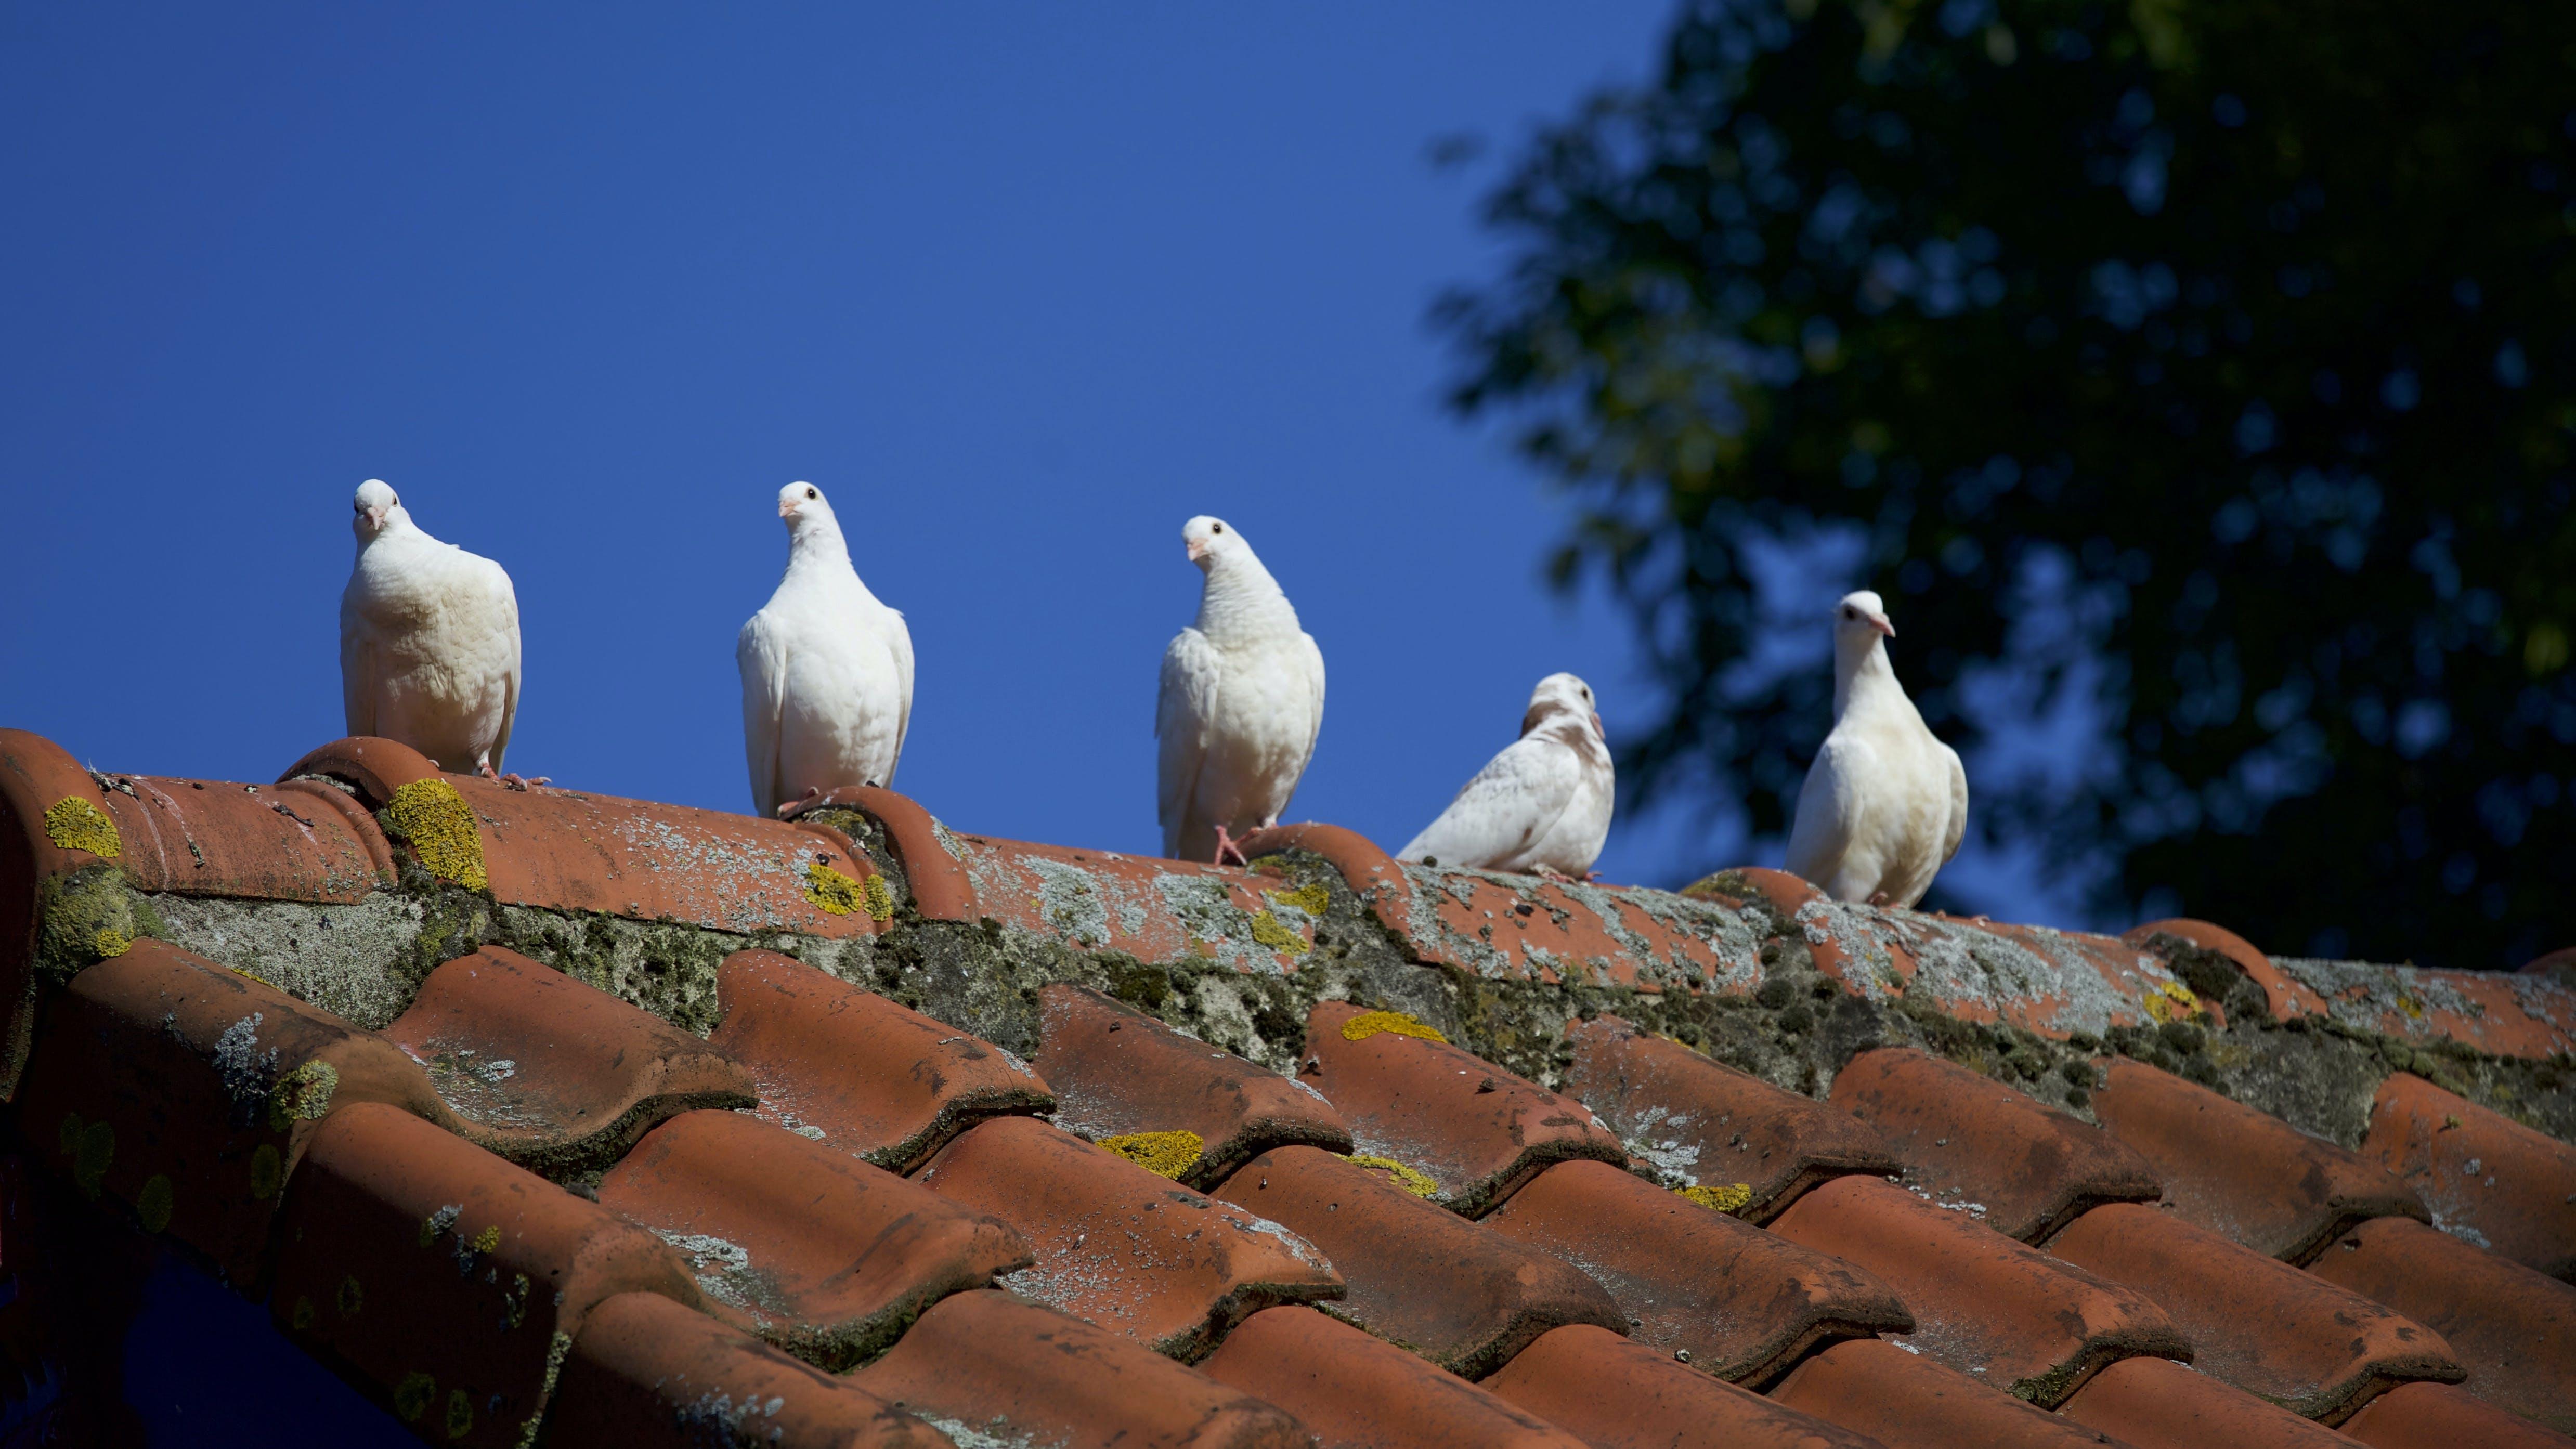 animal, animal photography, avian